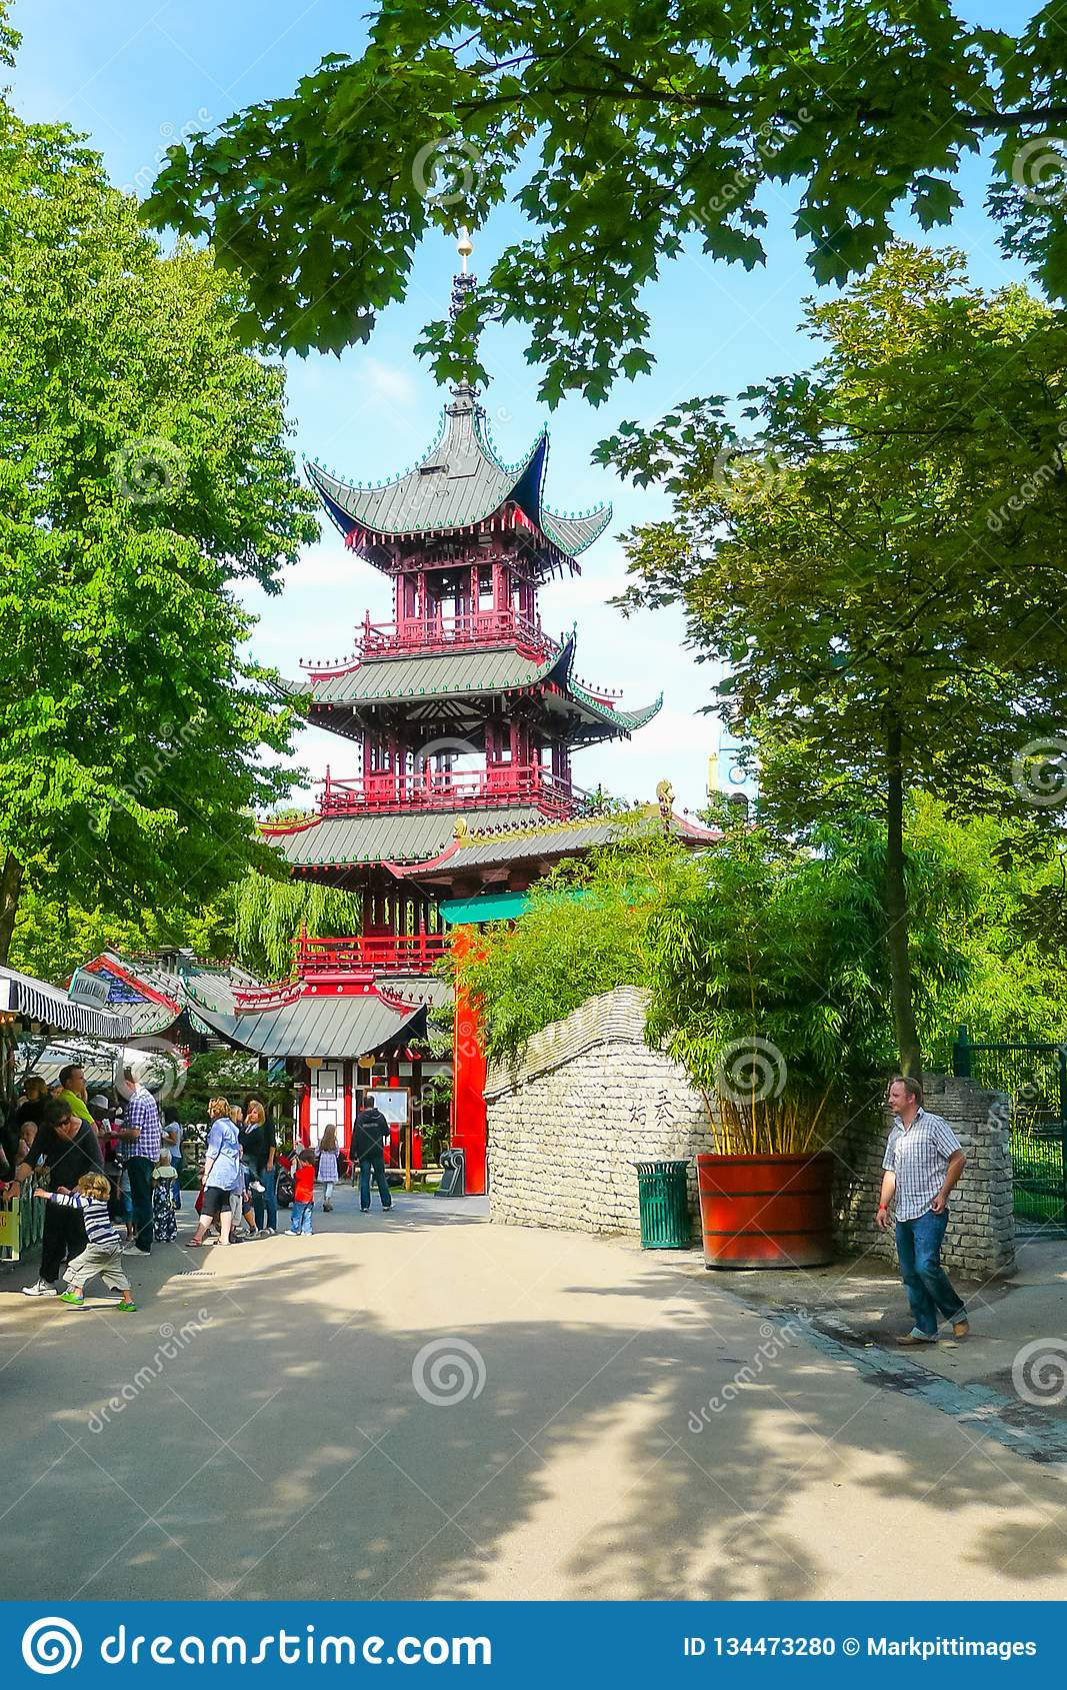 Китайская пагода в садах Tivoli Копенгаген Дания